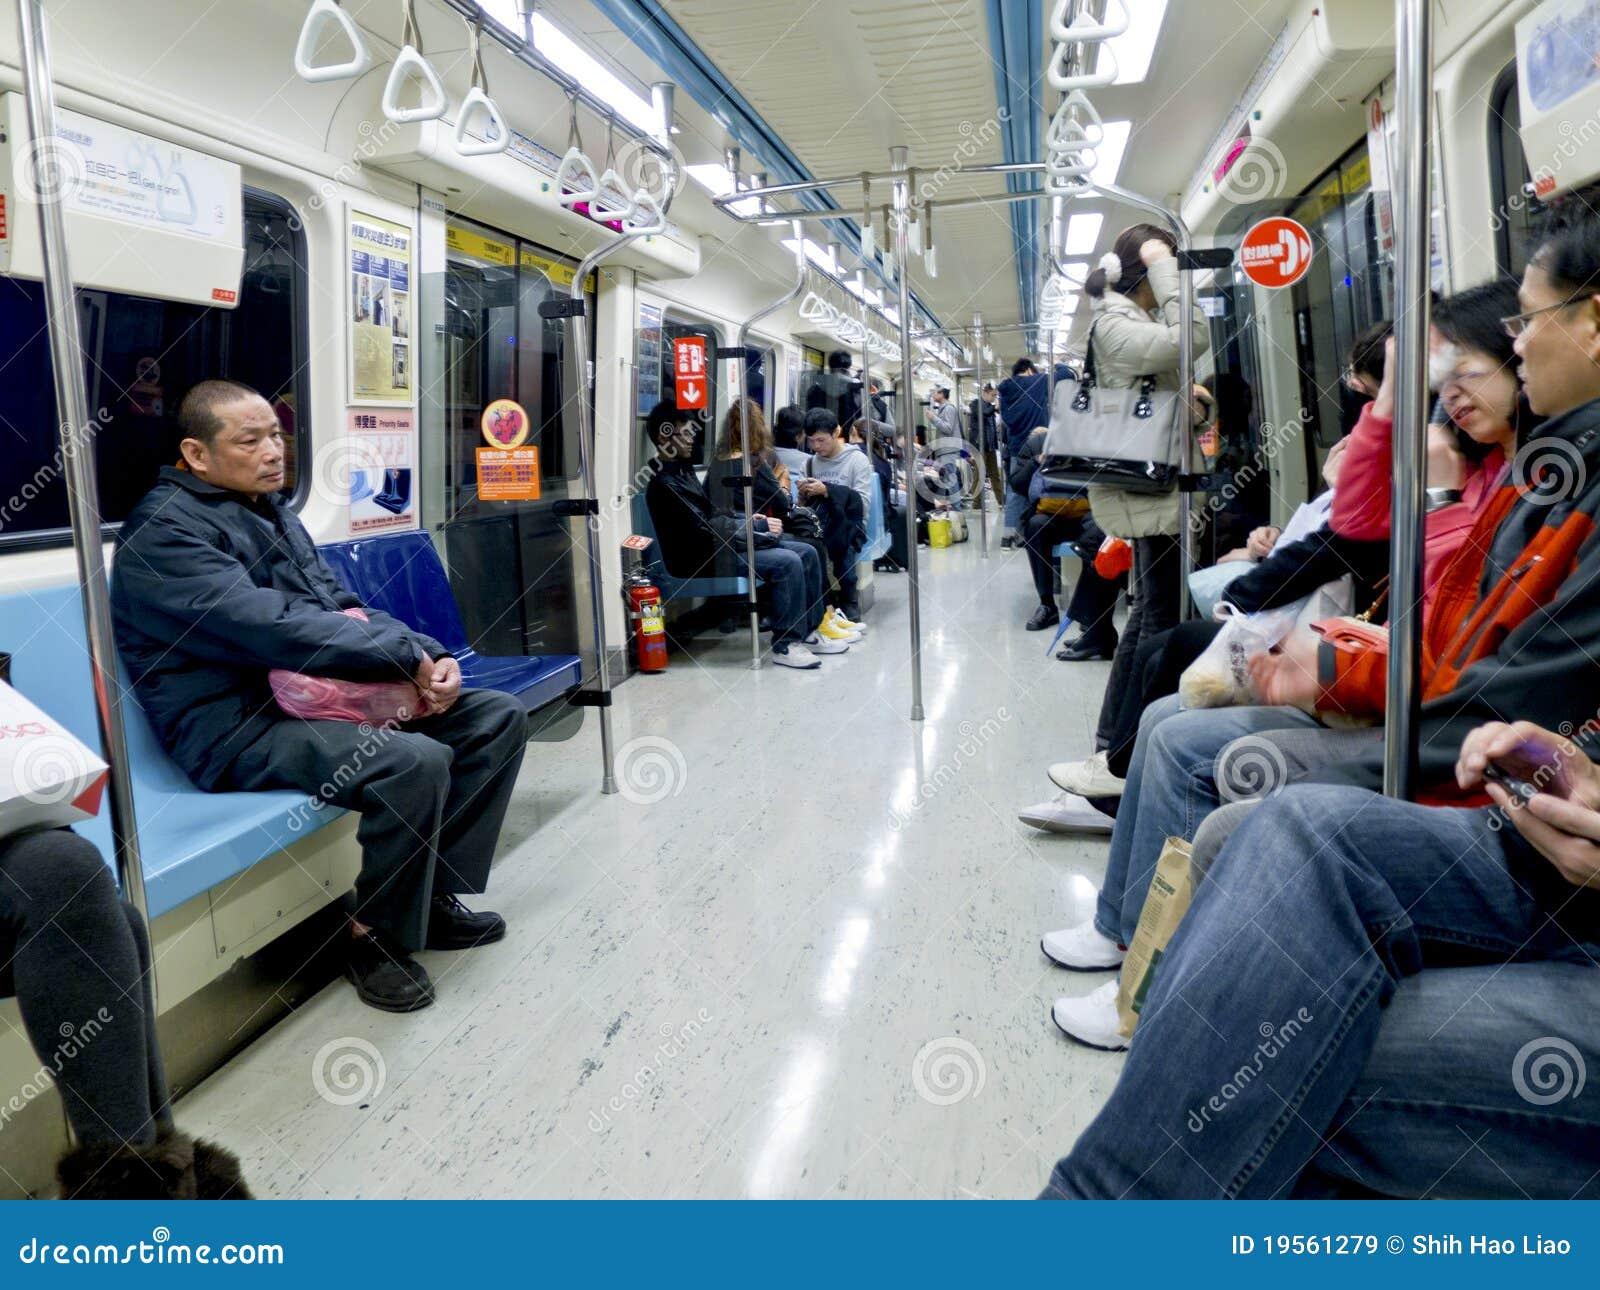 Inside metro carriage on february 6 in taipei editorial stock image image 19561279 - Carrage metro ...